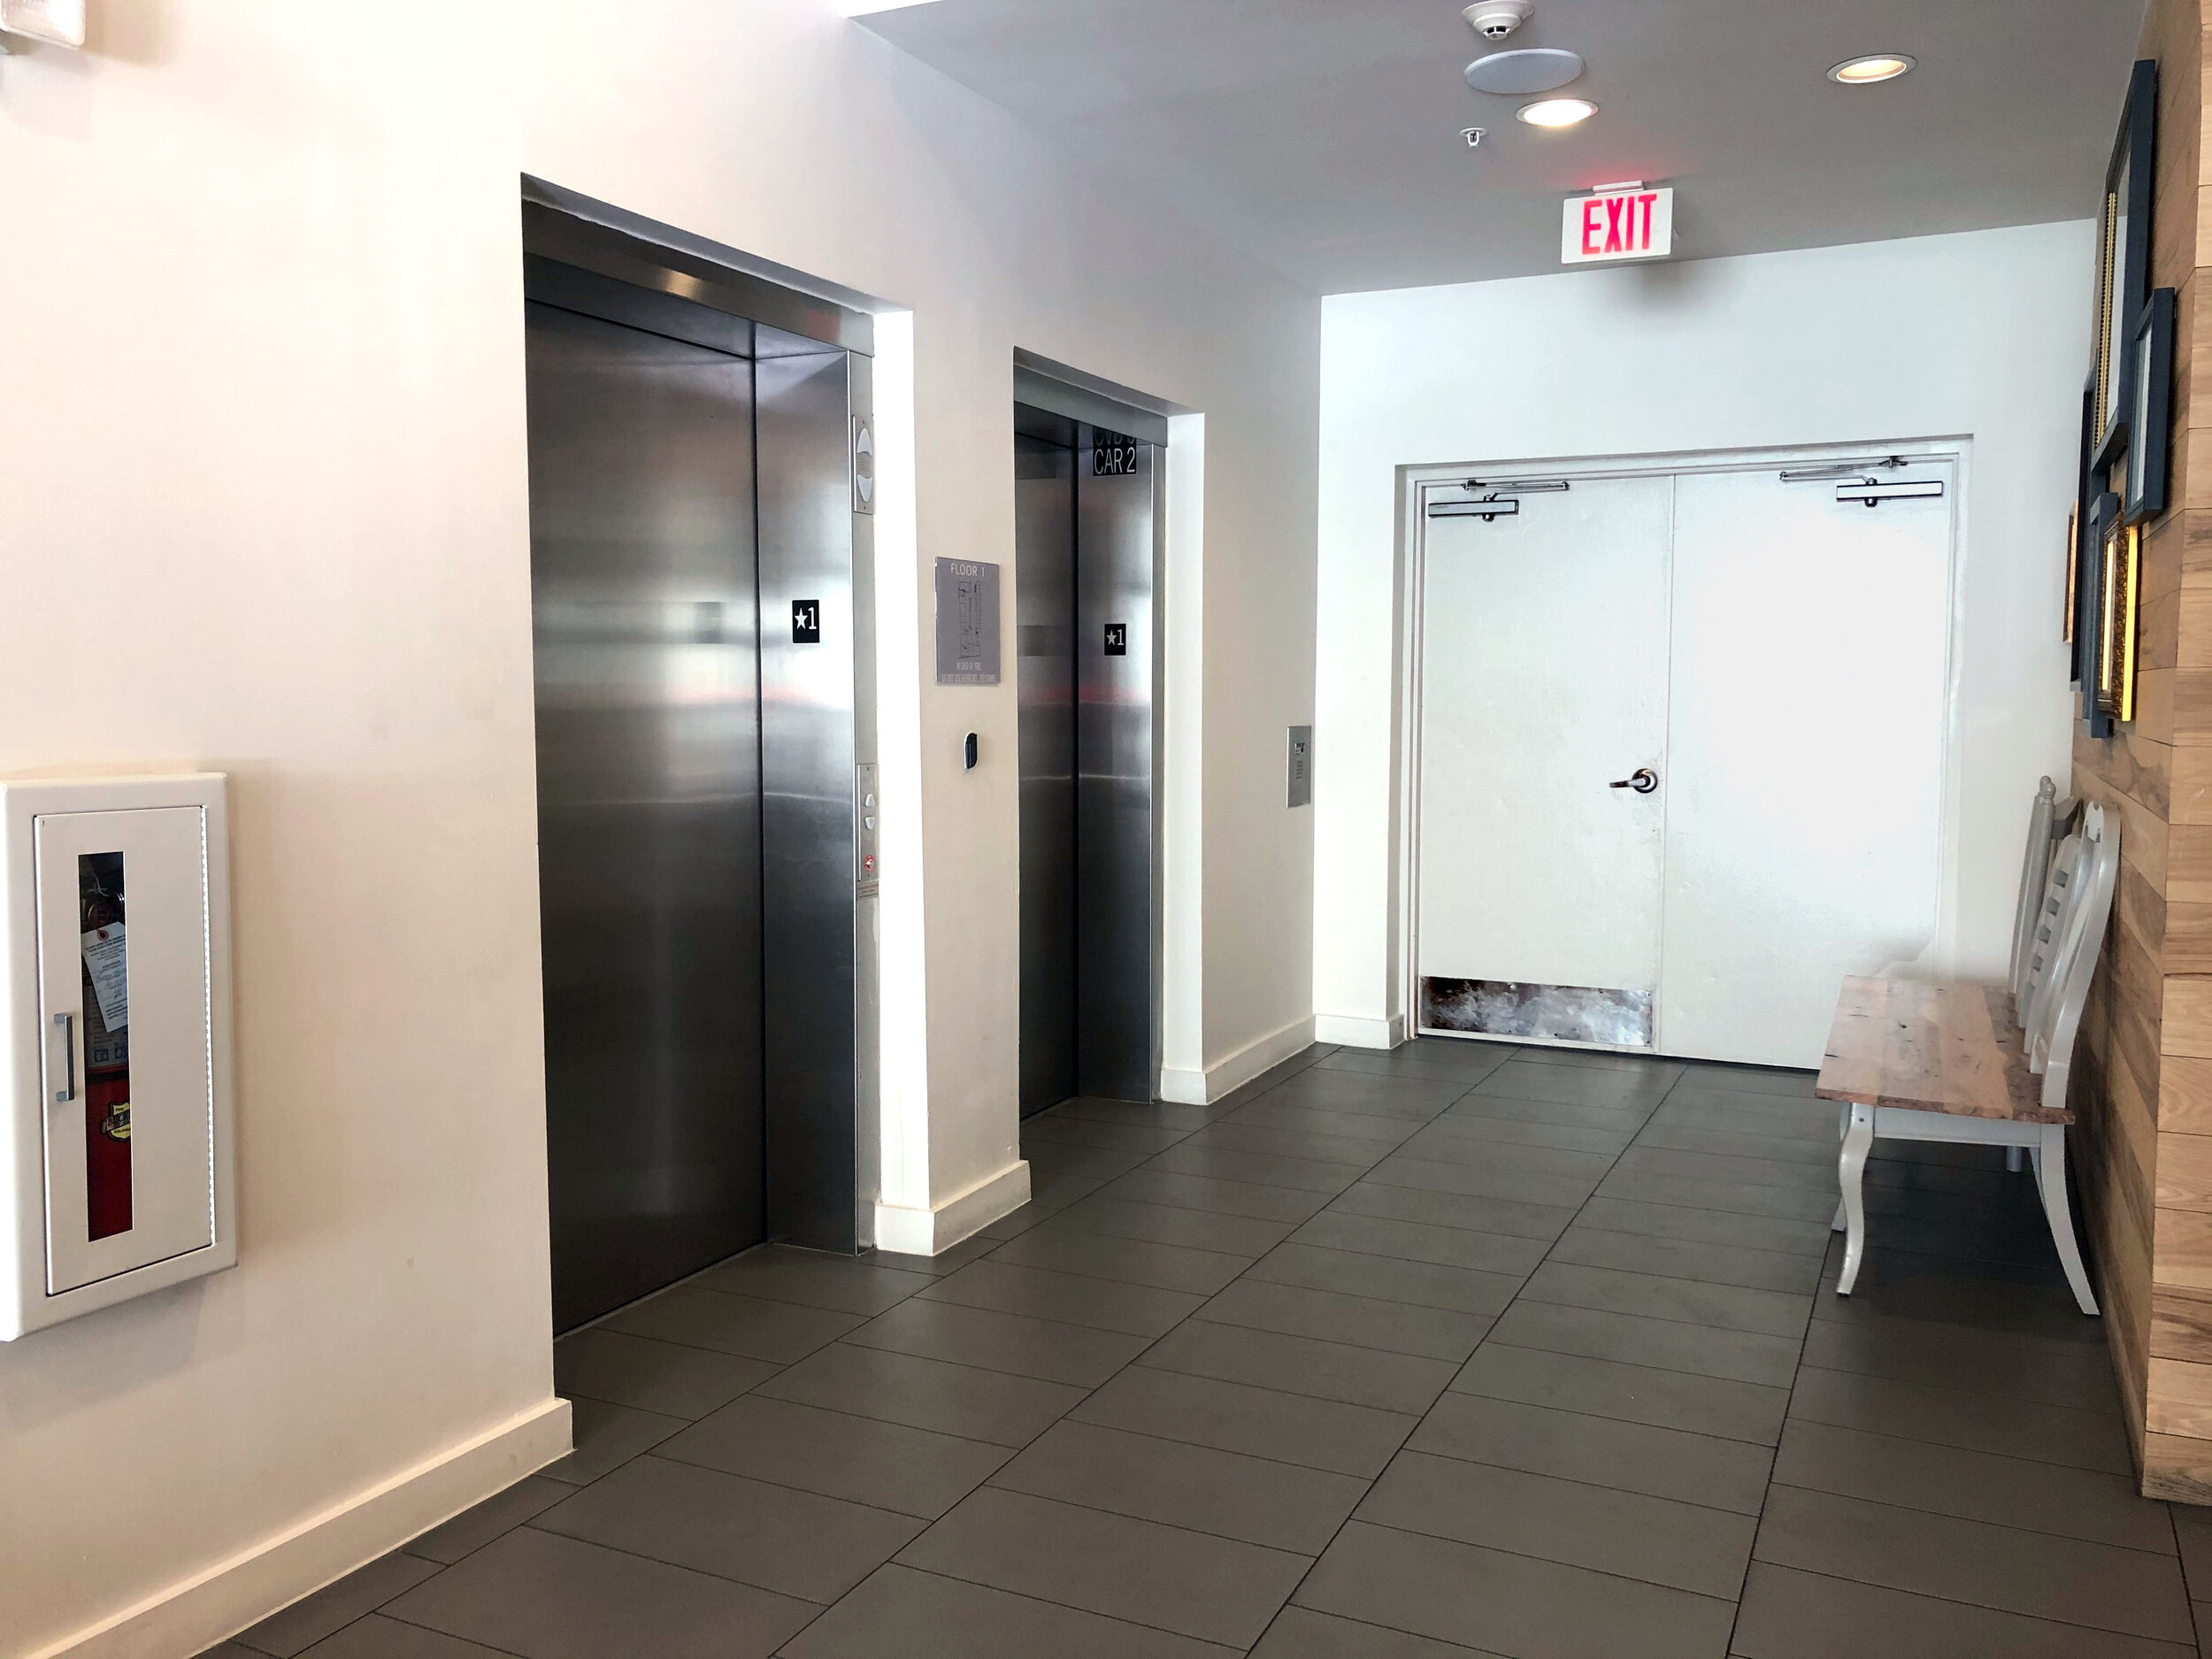 GLU bldg2 Elevators.jpg